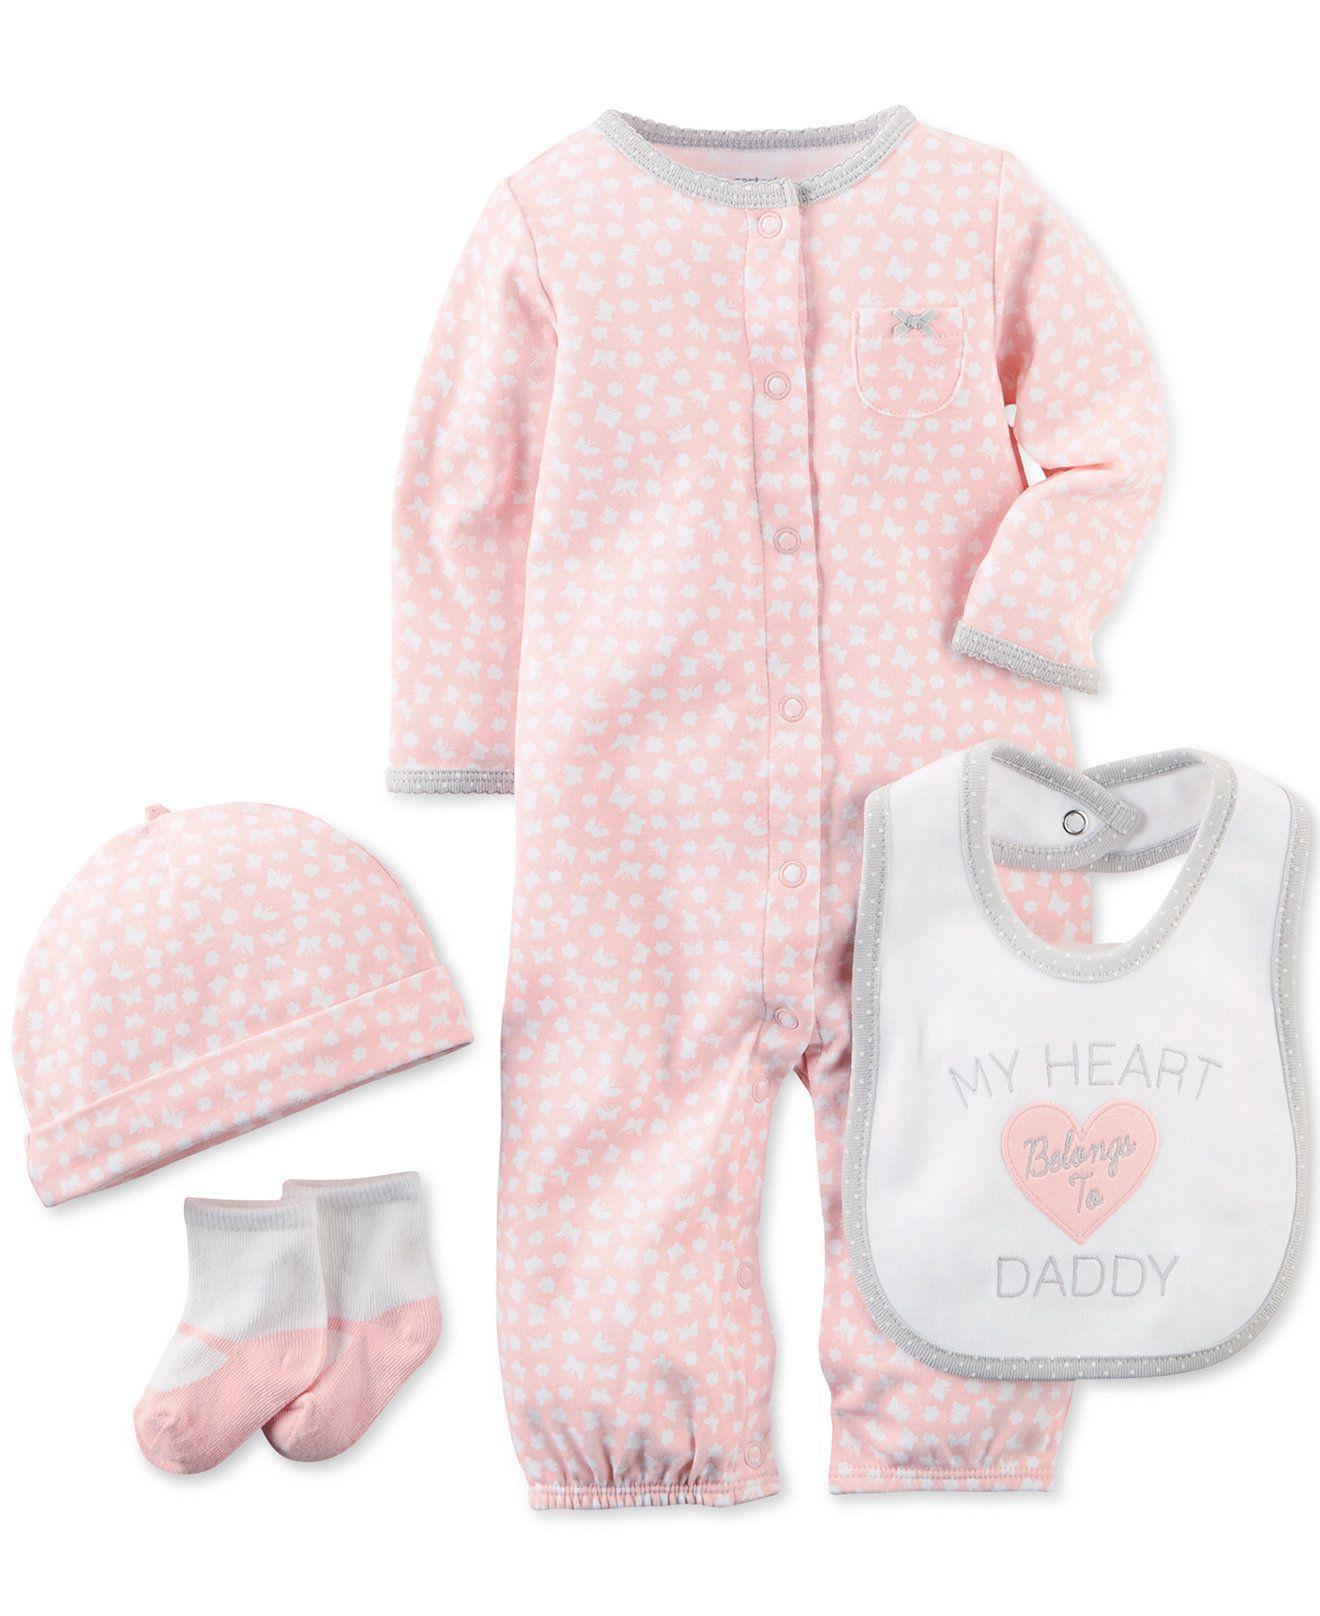 e5ba569bc79e4 Carter s Baby Girls  4-Piece Printed Layette Set - Kids Newborn Shop -  Macy s